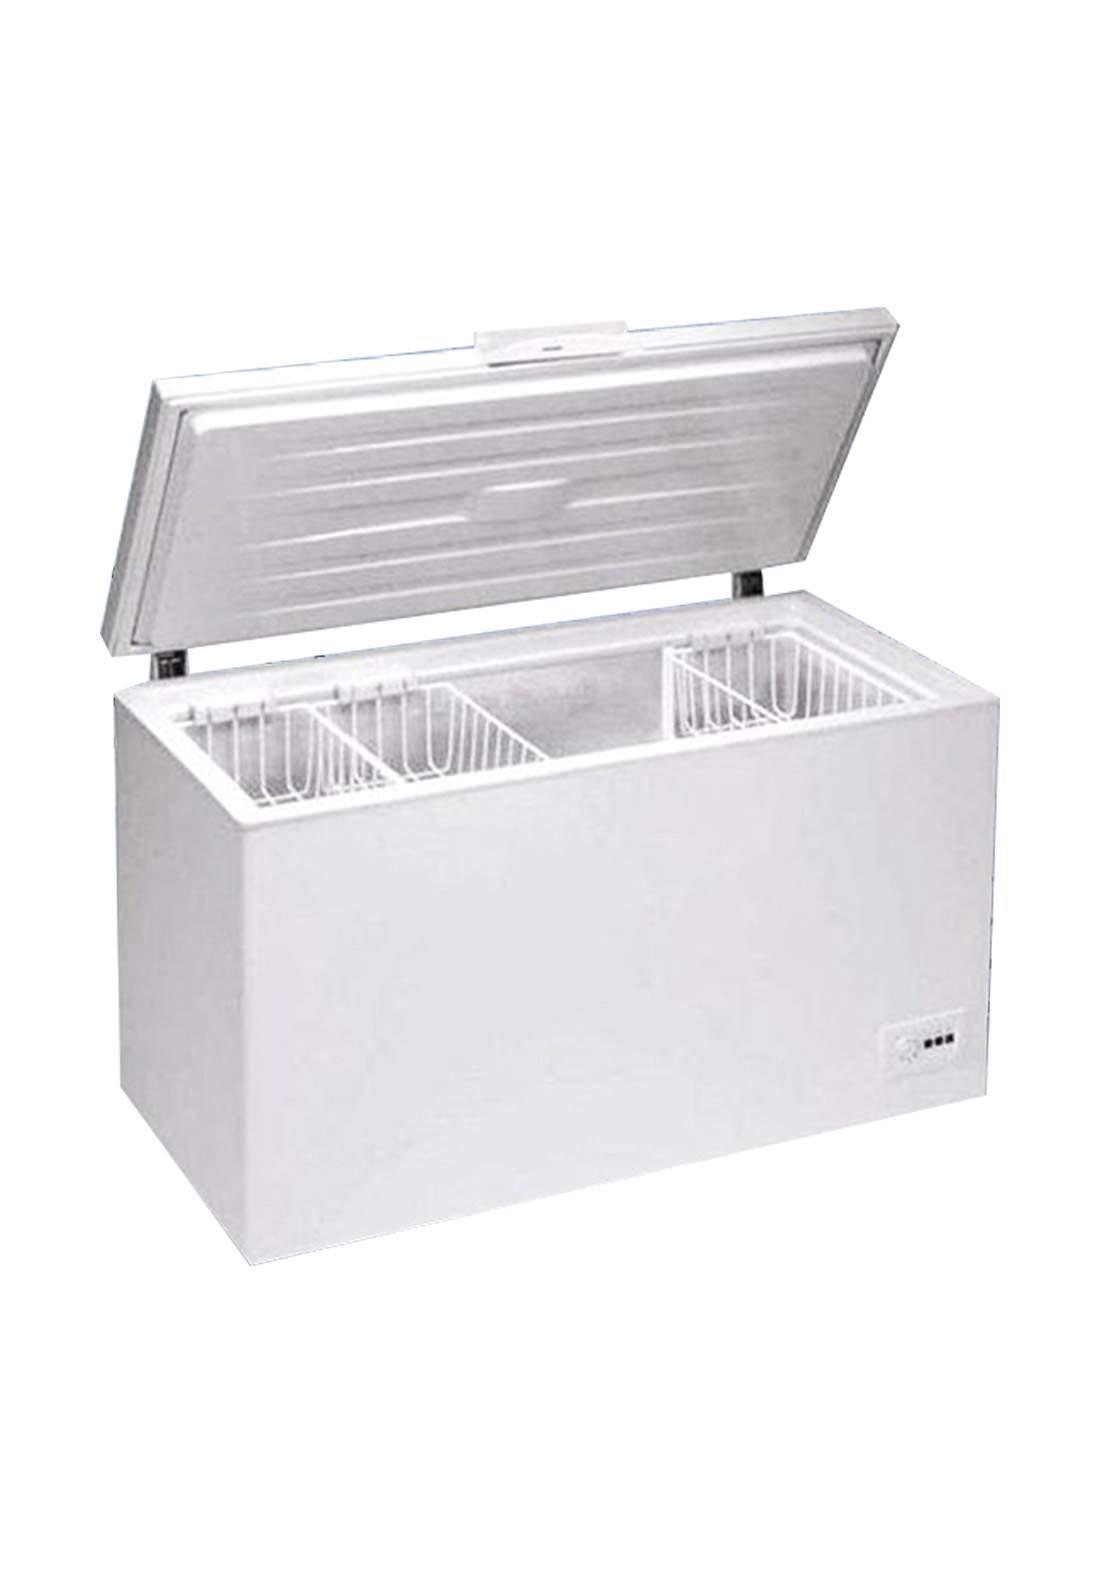 Beko HS40 Chest Freezer 16Ft - White